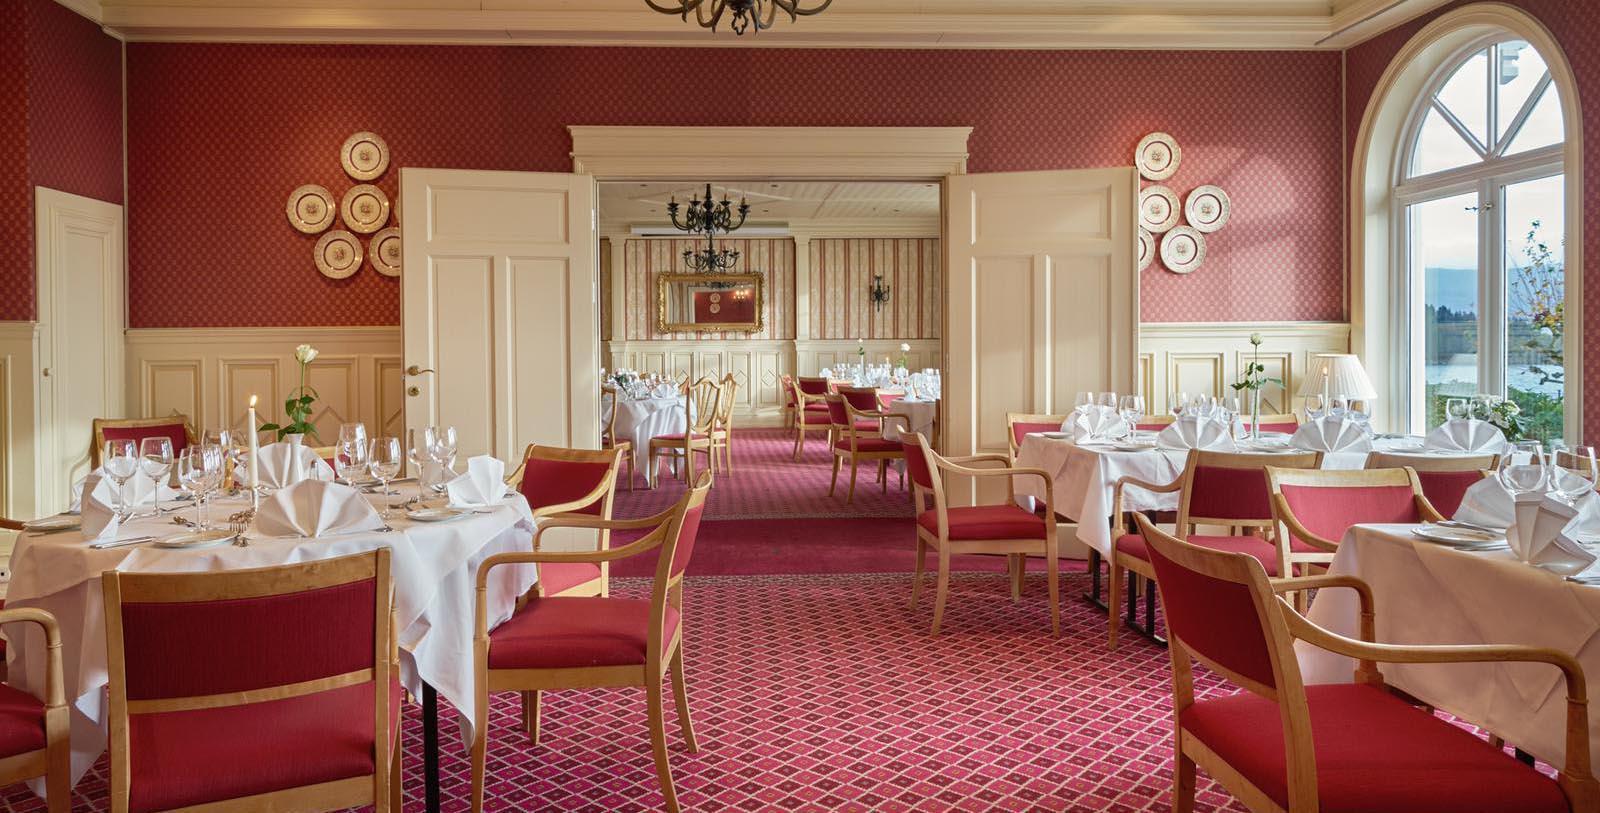 Image of Dining Room at Solstrand Hotel & Bad, 1896, Member of Historic Hotels Worldwide, in Os, Bergen, Norway, Taste